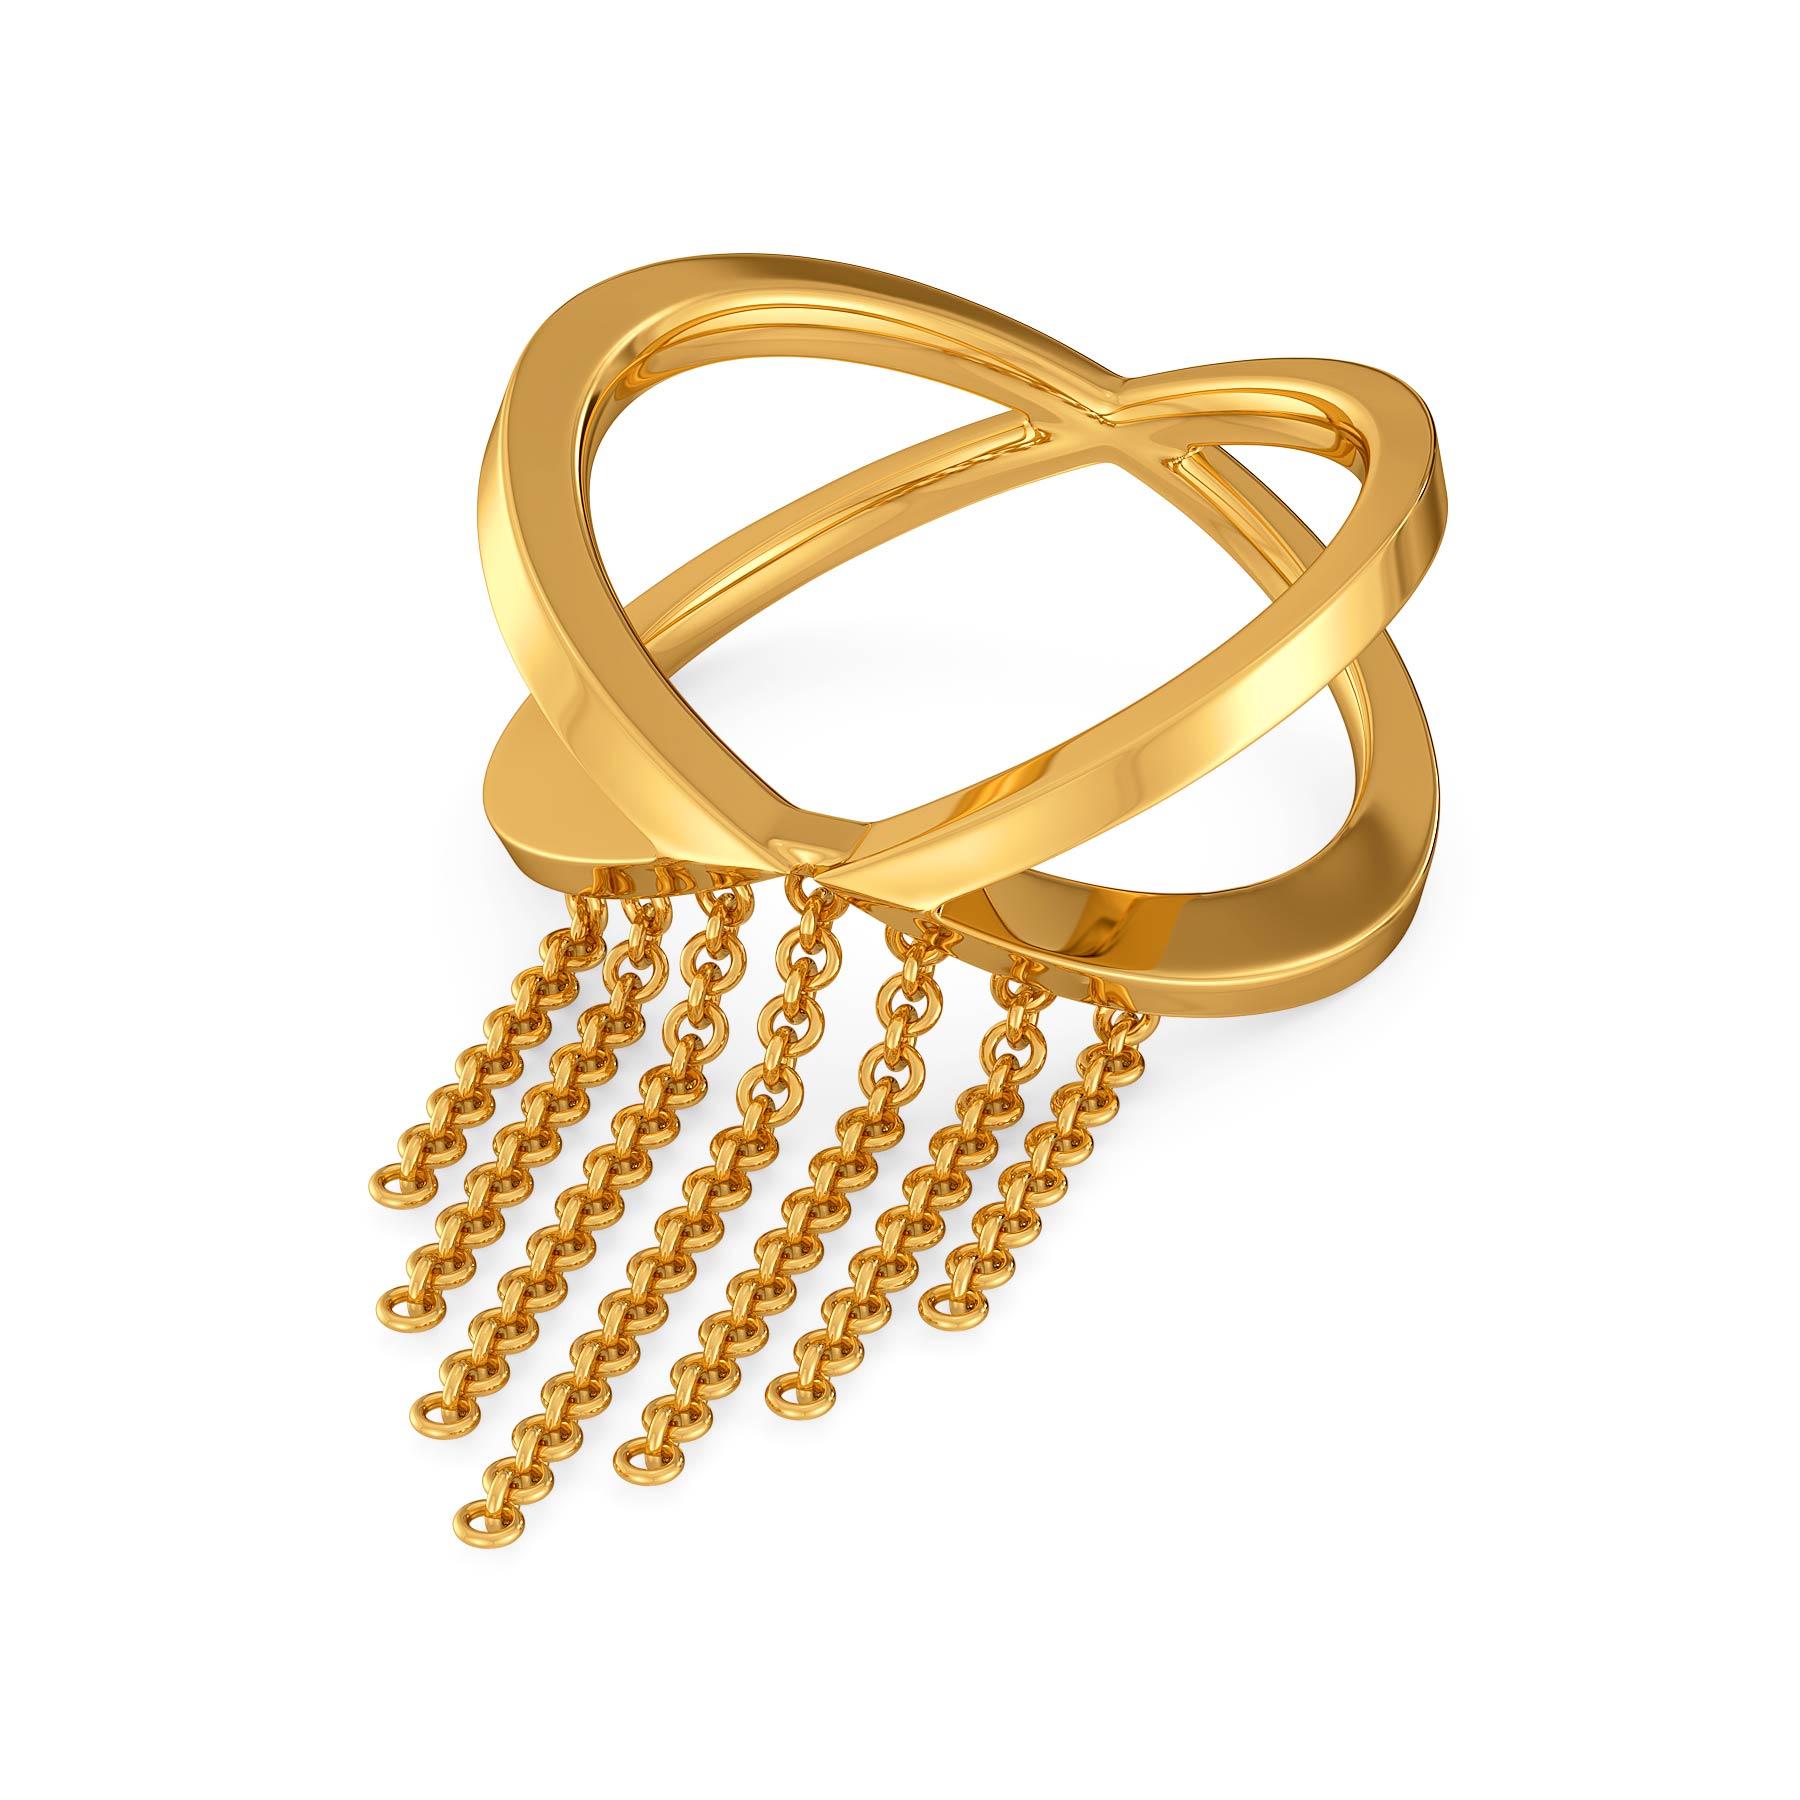 Fringe It Up Gold Rings